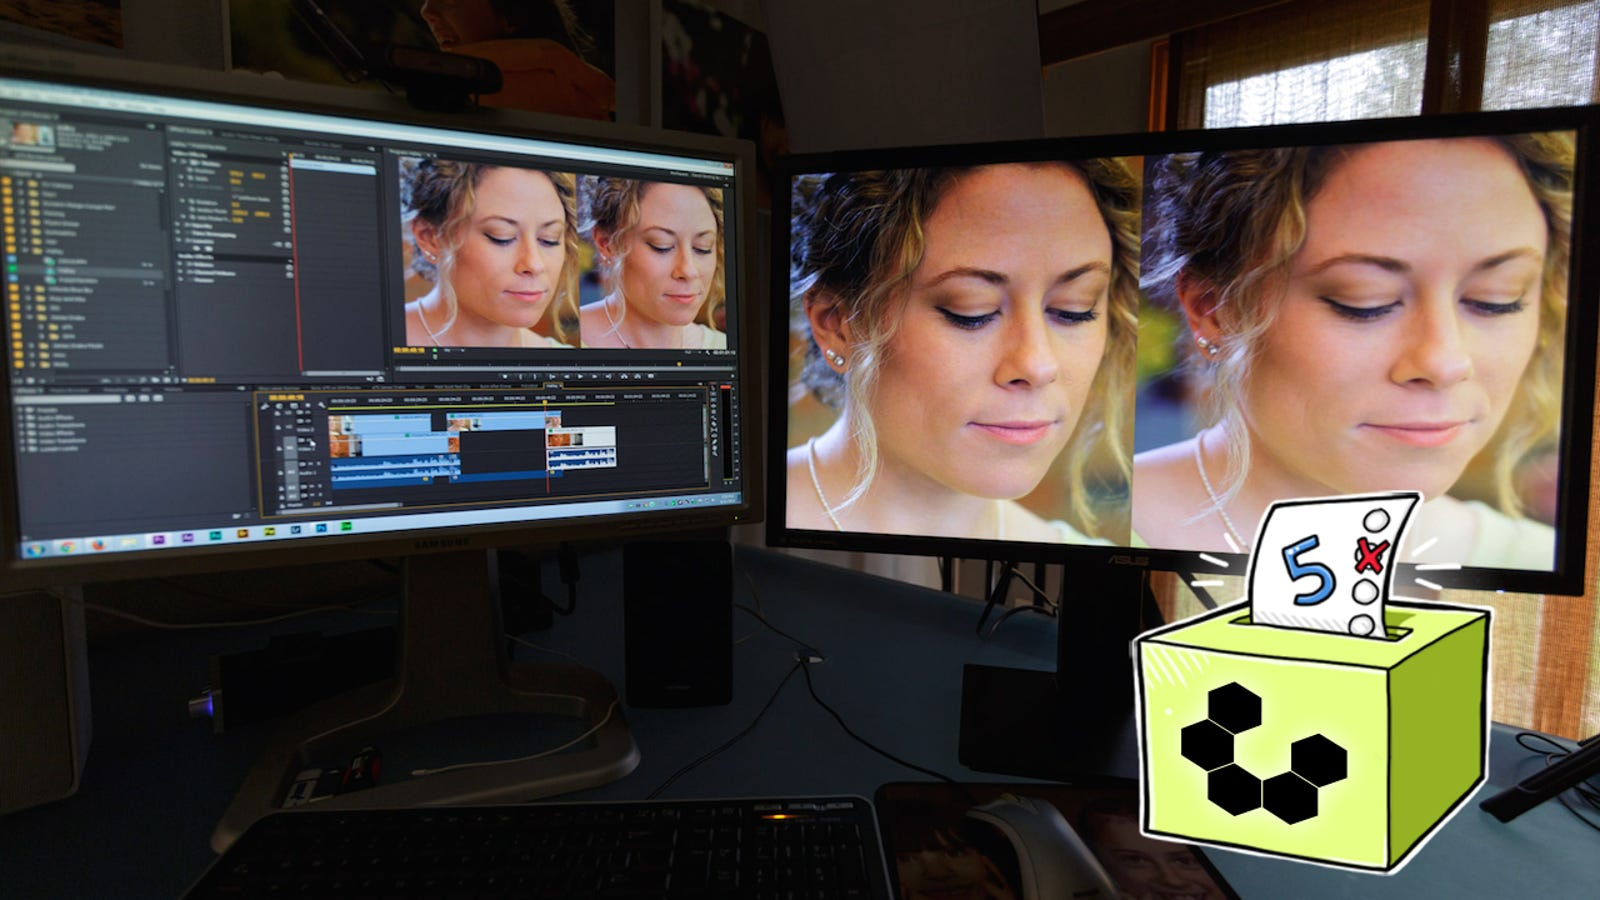 Five Best 4k Computer Monitors